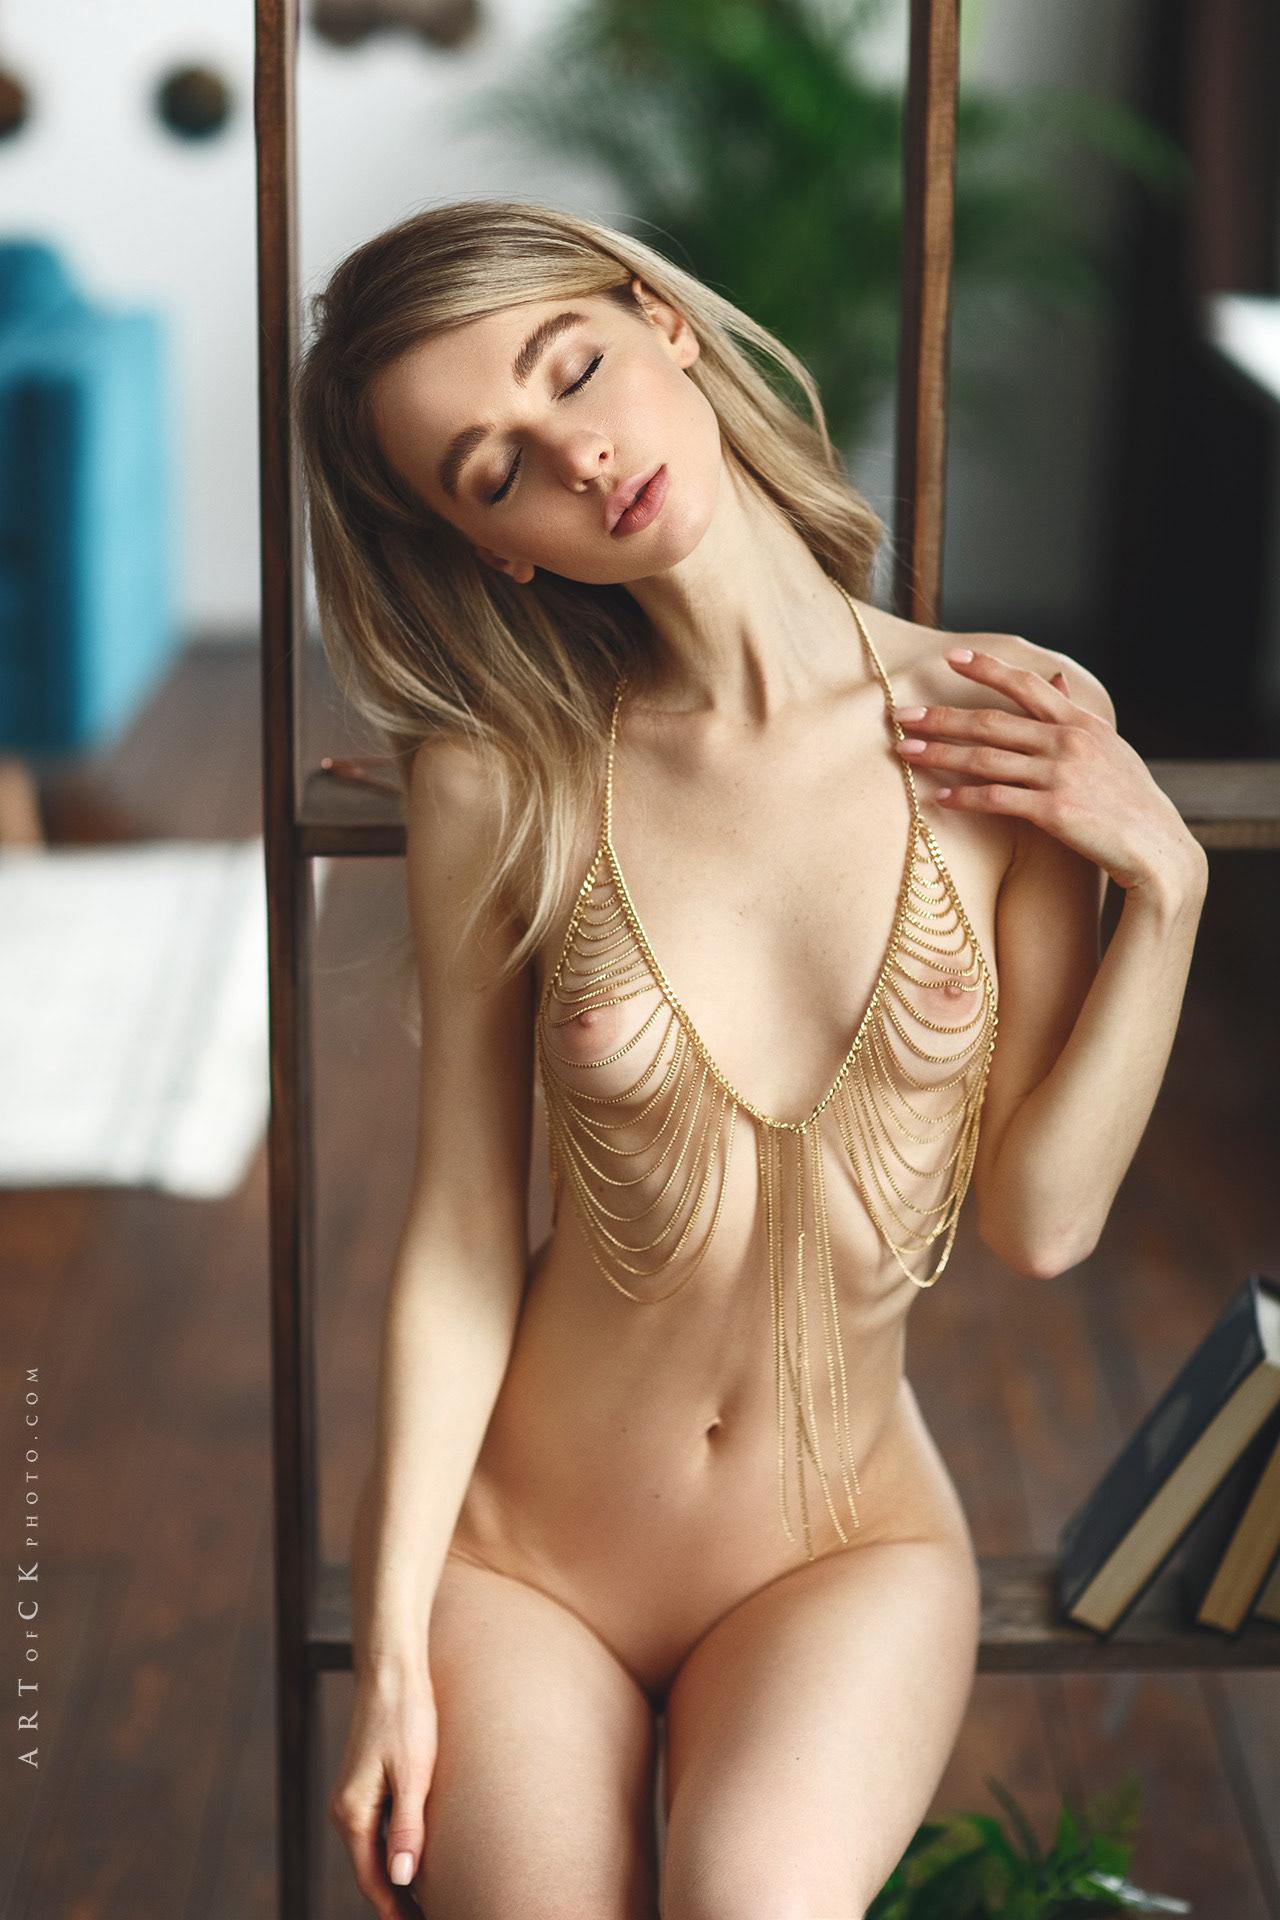 Anna / Stepan Kvardakov